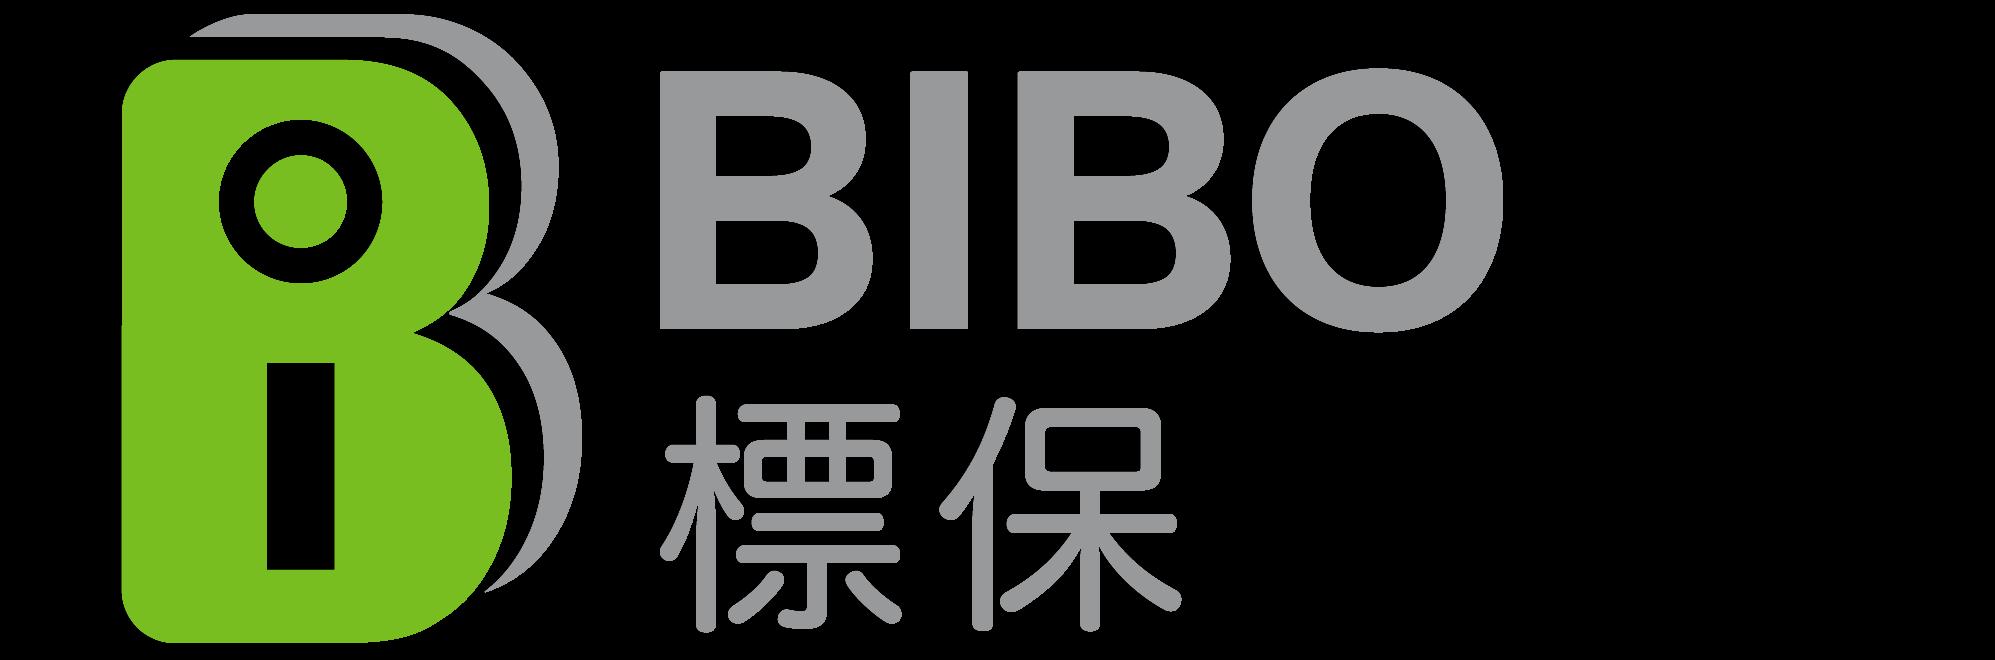 BIBO Limited